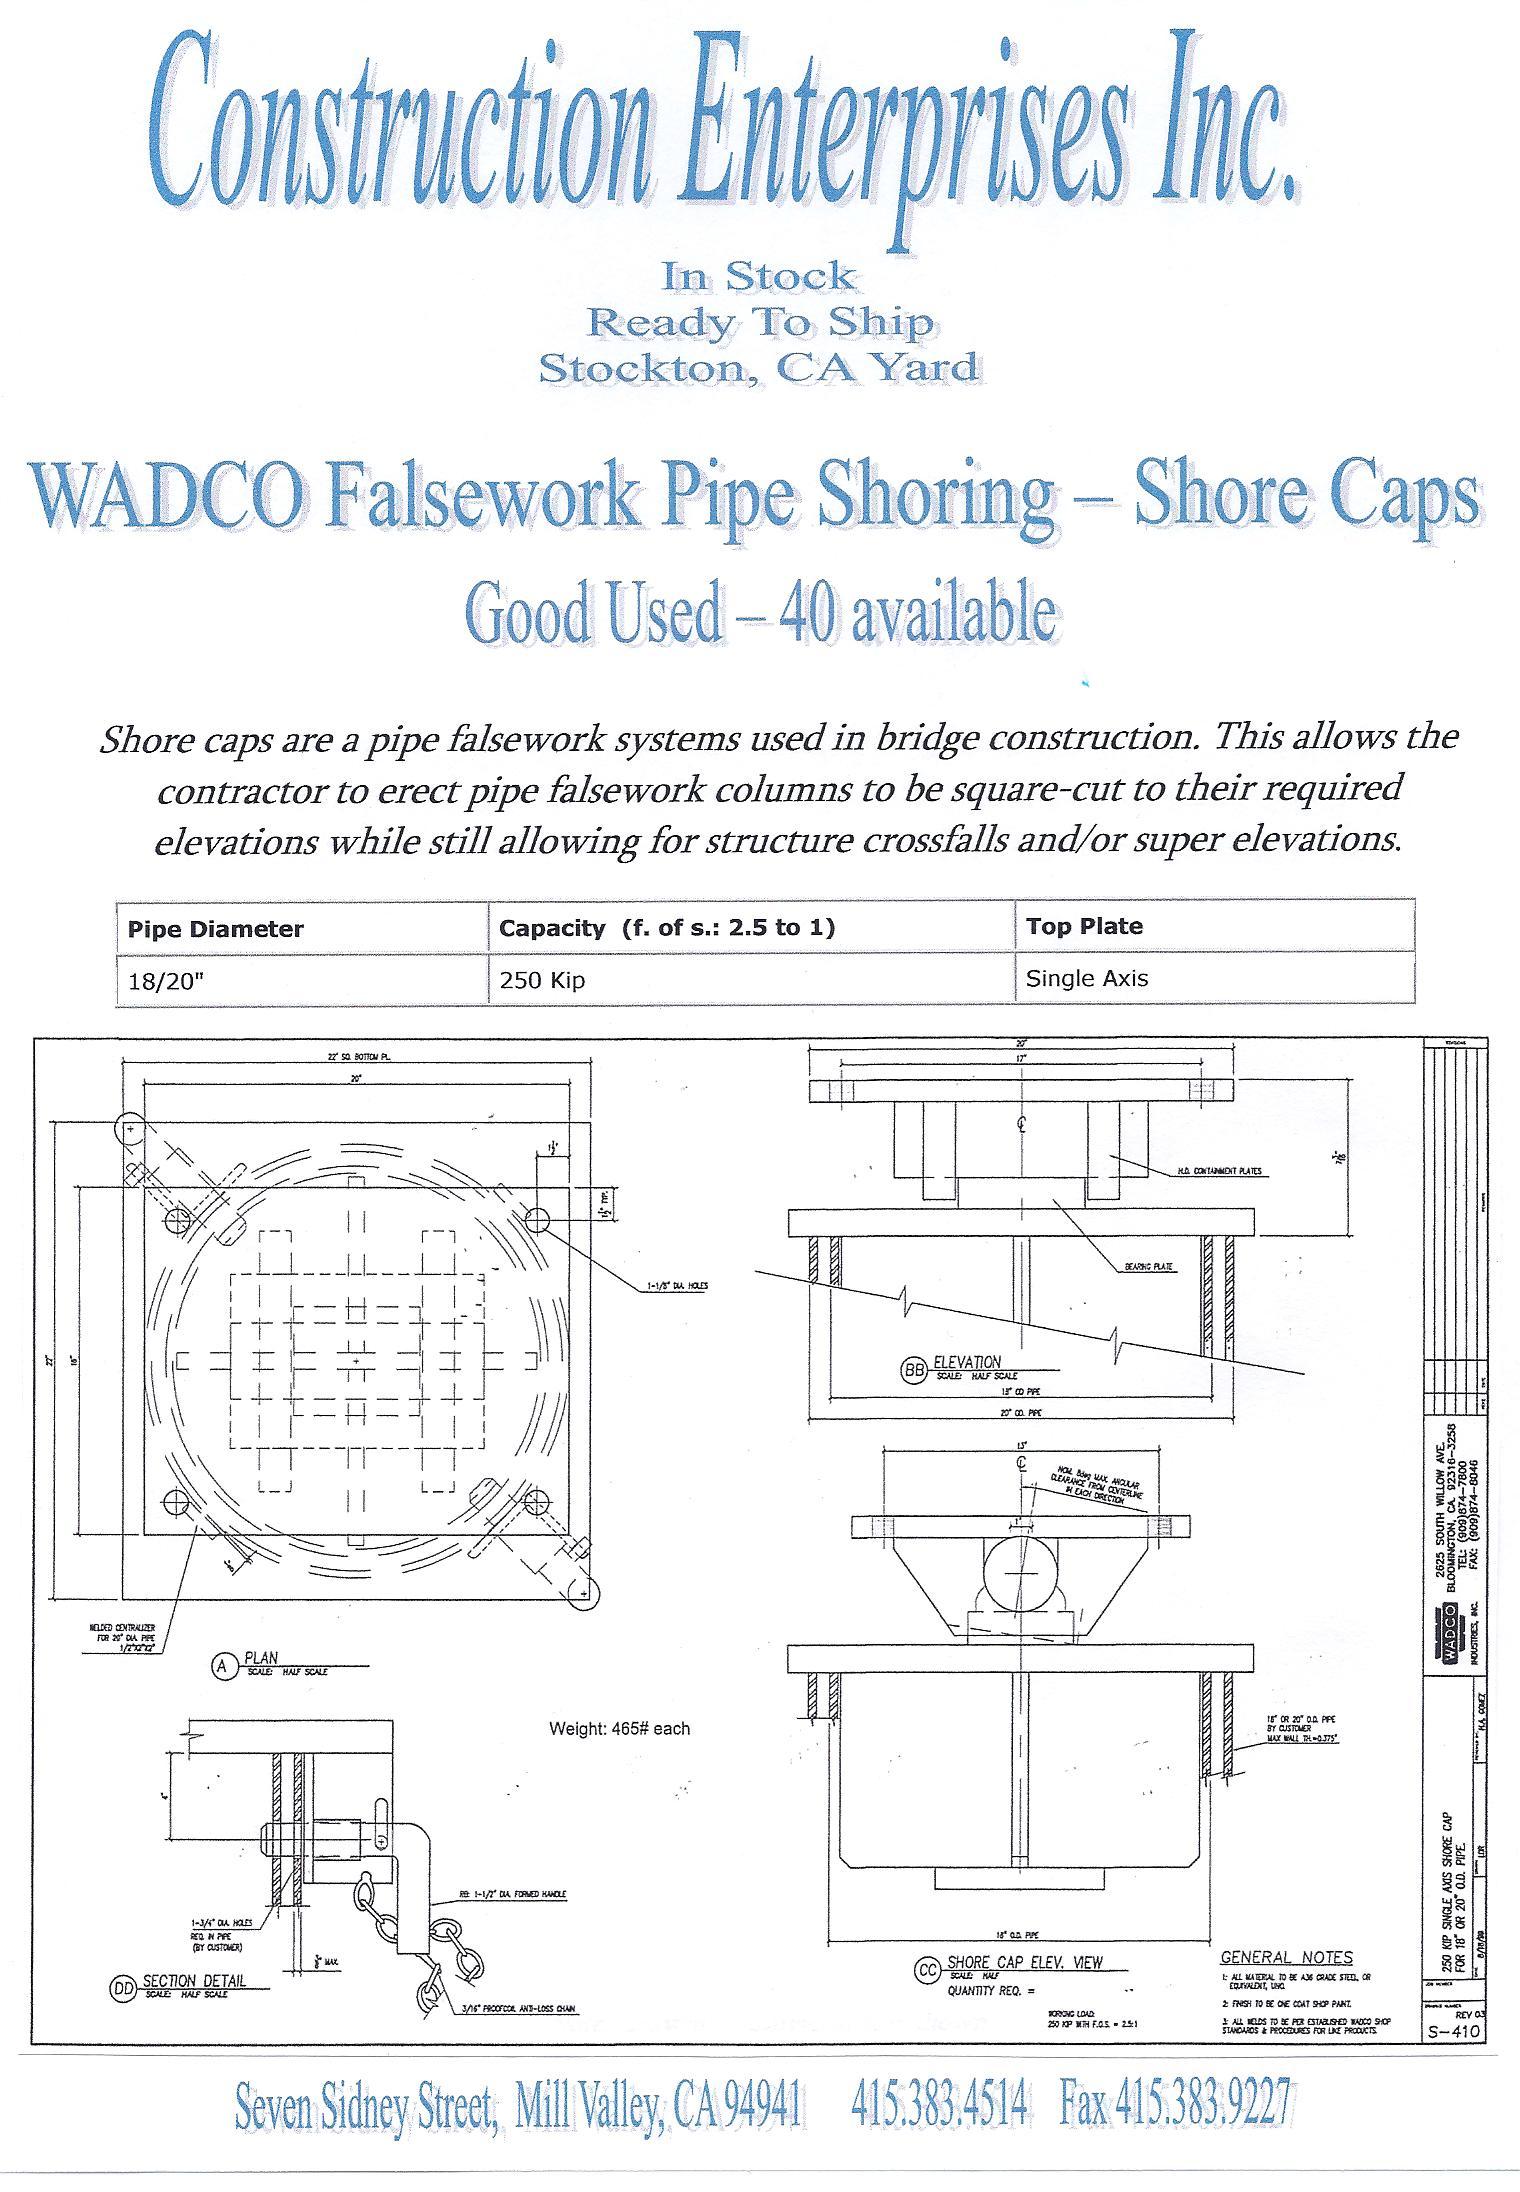 wadco-falsework-2n